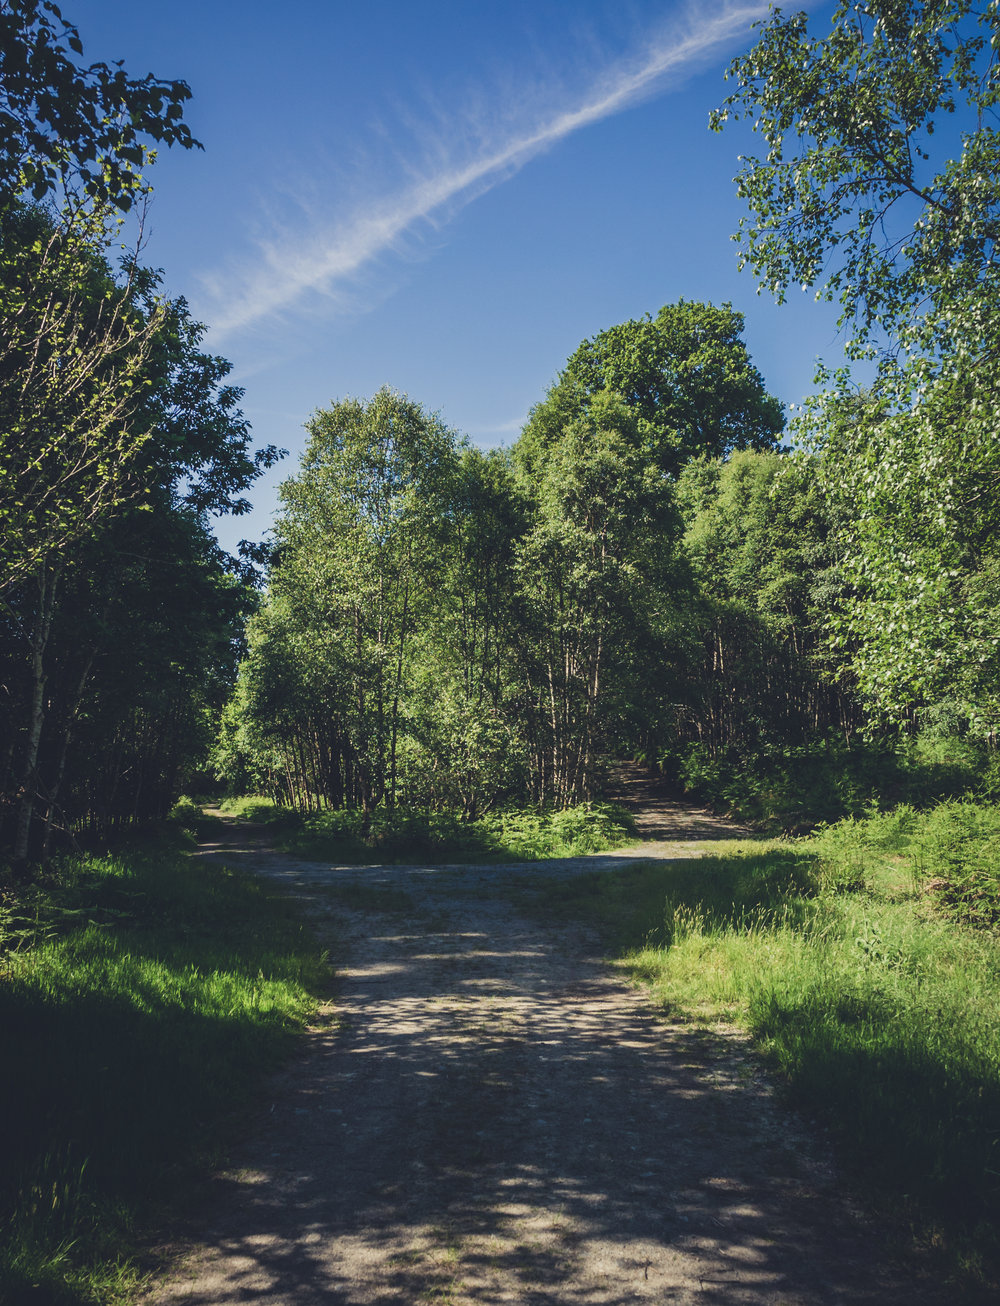 Vale of Clara. Walking in Wicklow. The garden of Ireland. Wicklow. Clara Vale. Ferns. Ireland. trees. photography. sunlight. path. two paths.jpg